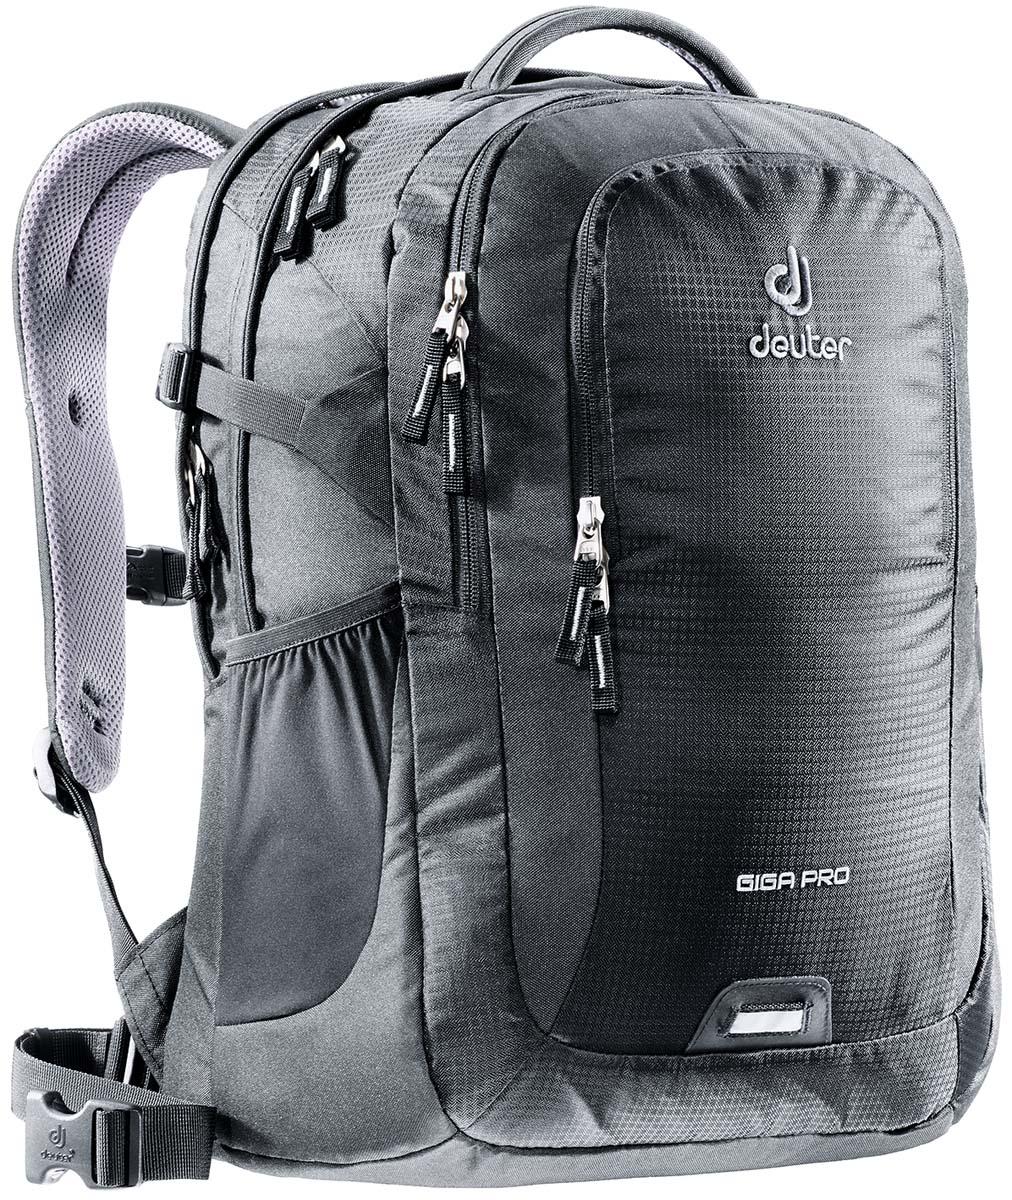 Рюкзак Deuter Daypacks Giga Pro, цвет: черный, 31 л рюкзак deuter daypacks giga pro black